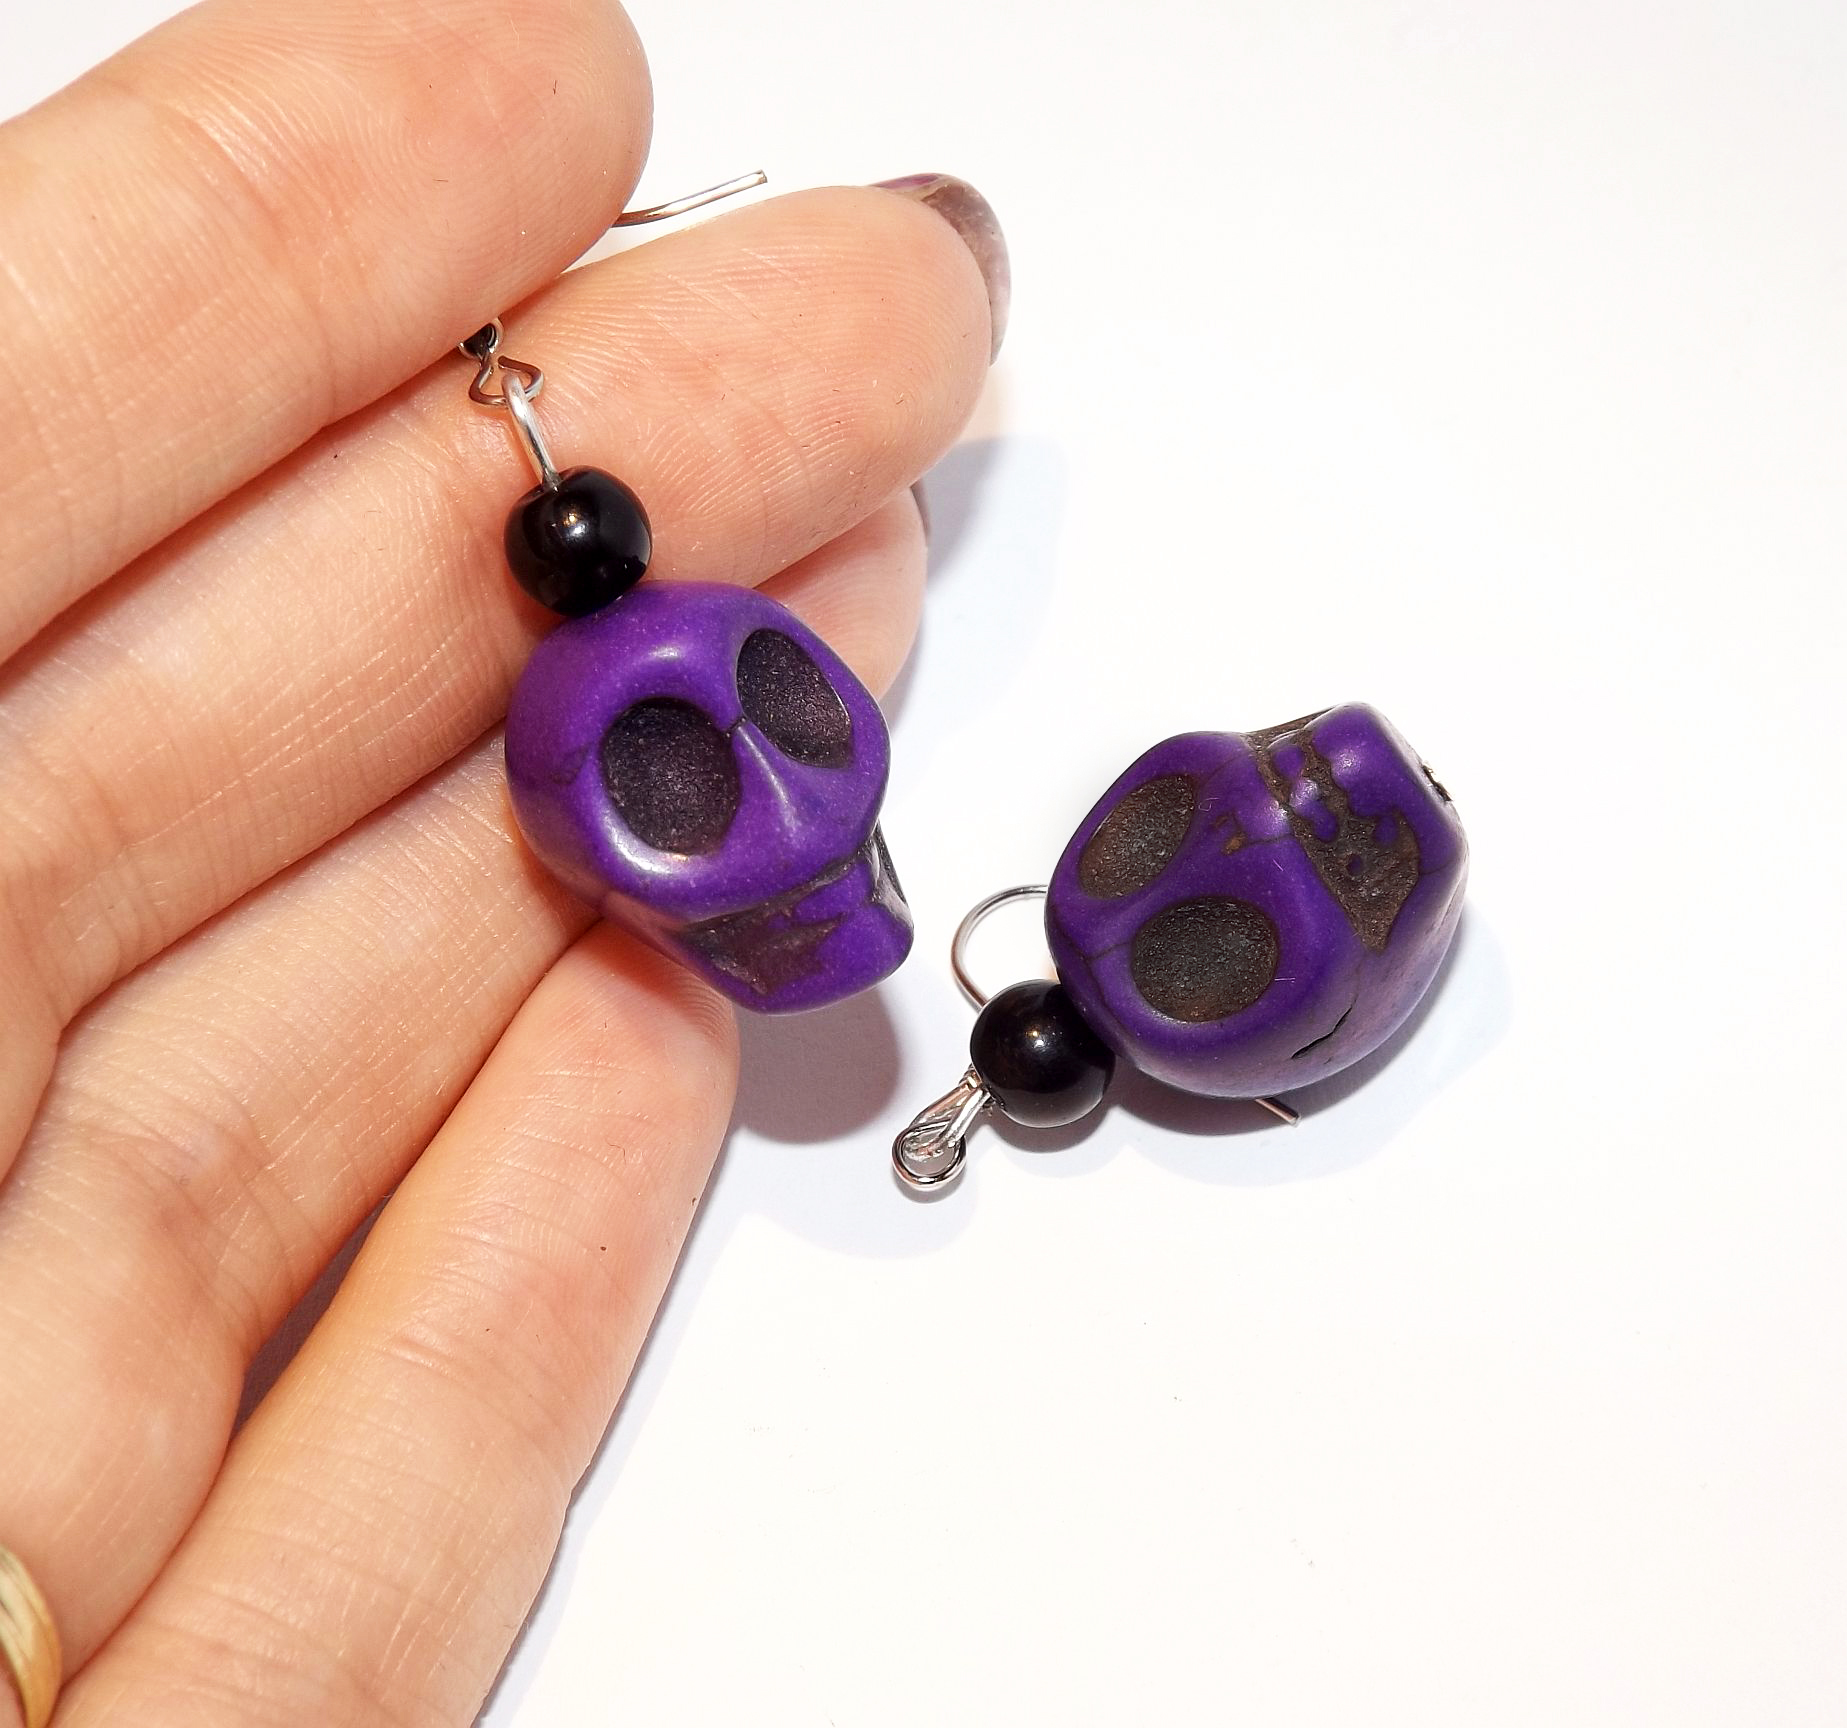 handmade_purple_howlite_skull_earrings_earrings_3.jpg